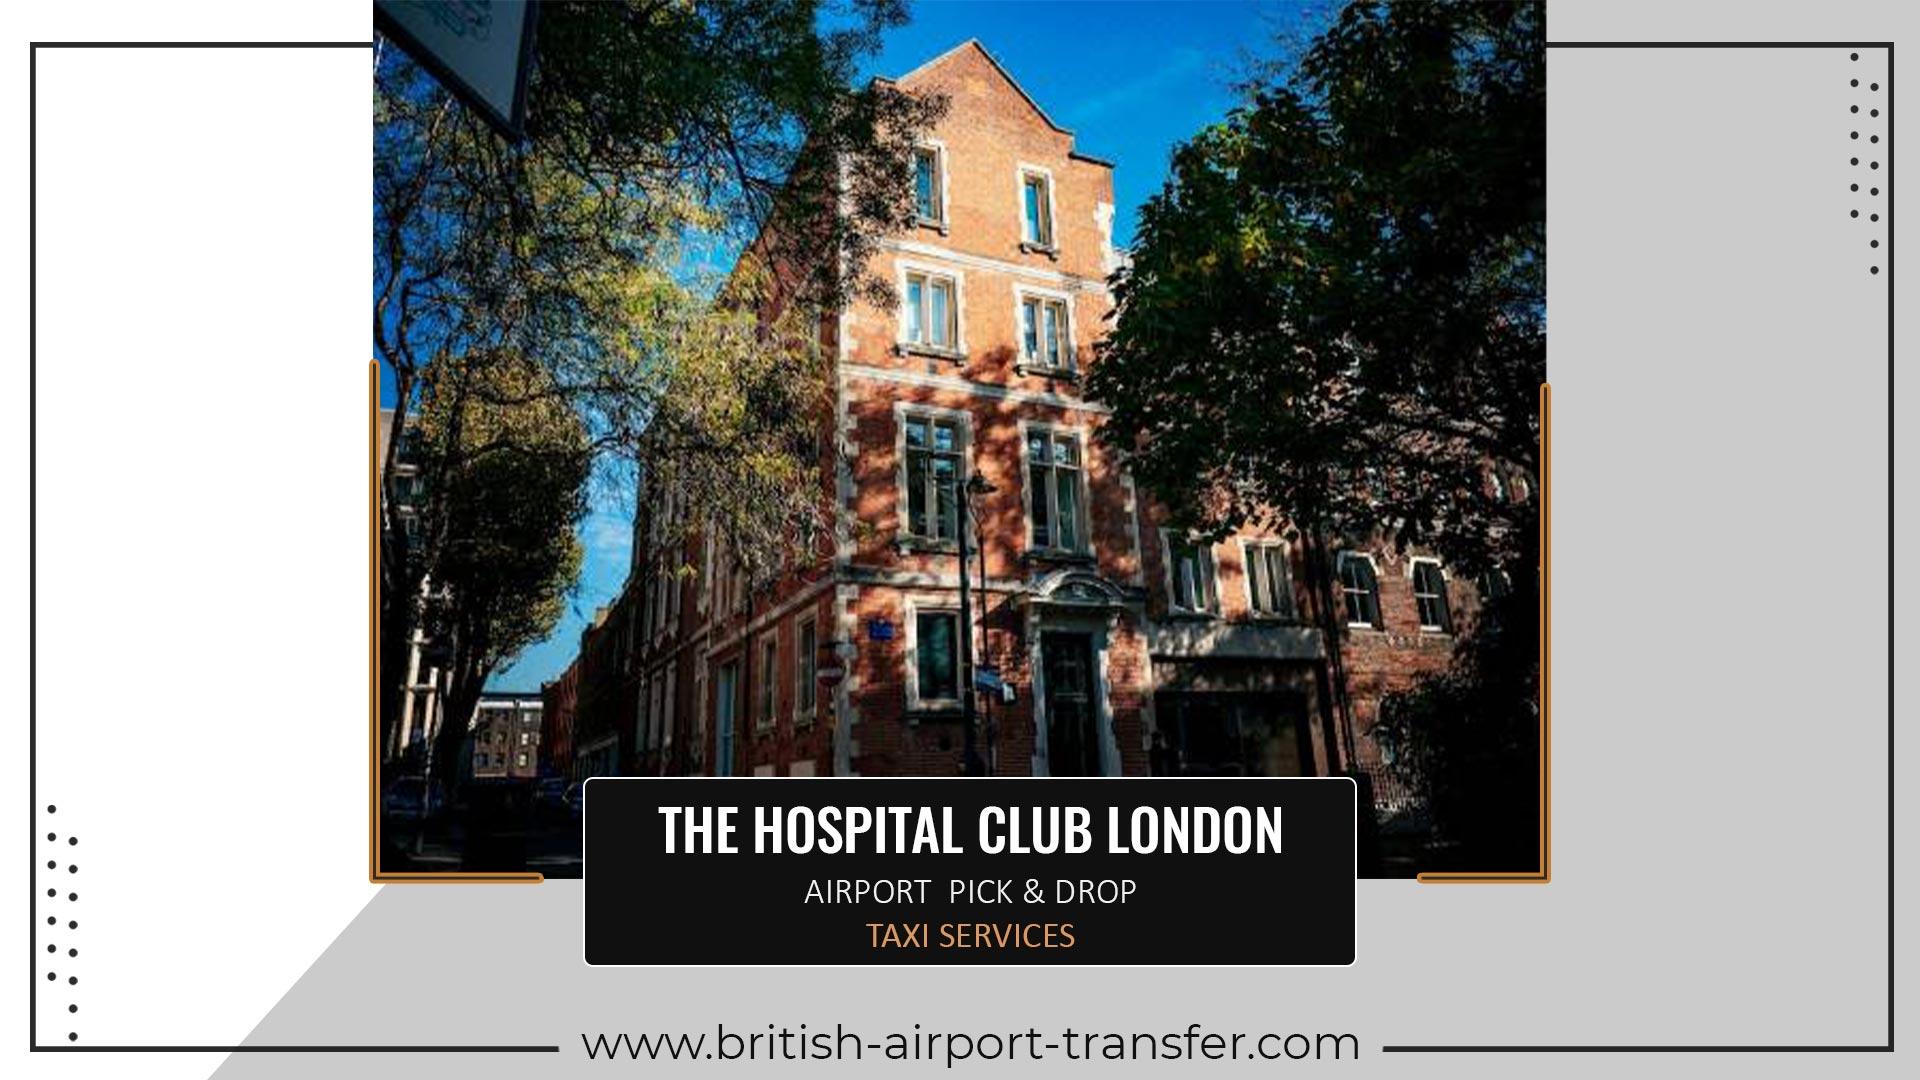 Taxi Cab – The Hospital Club London / WC2H 9HQ